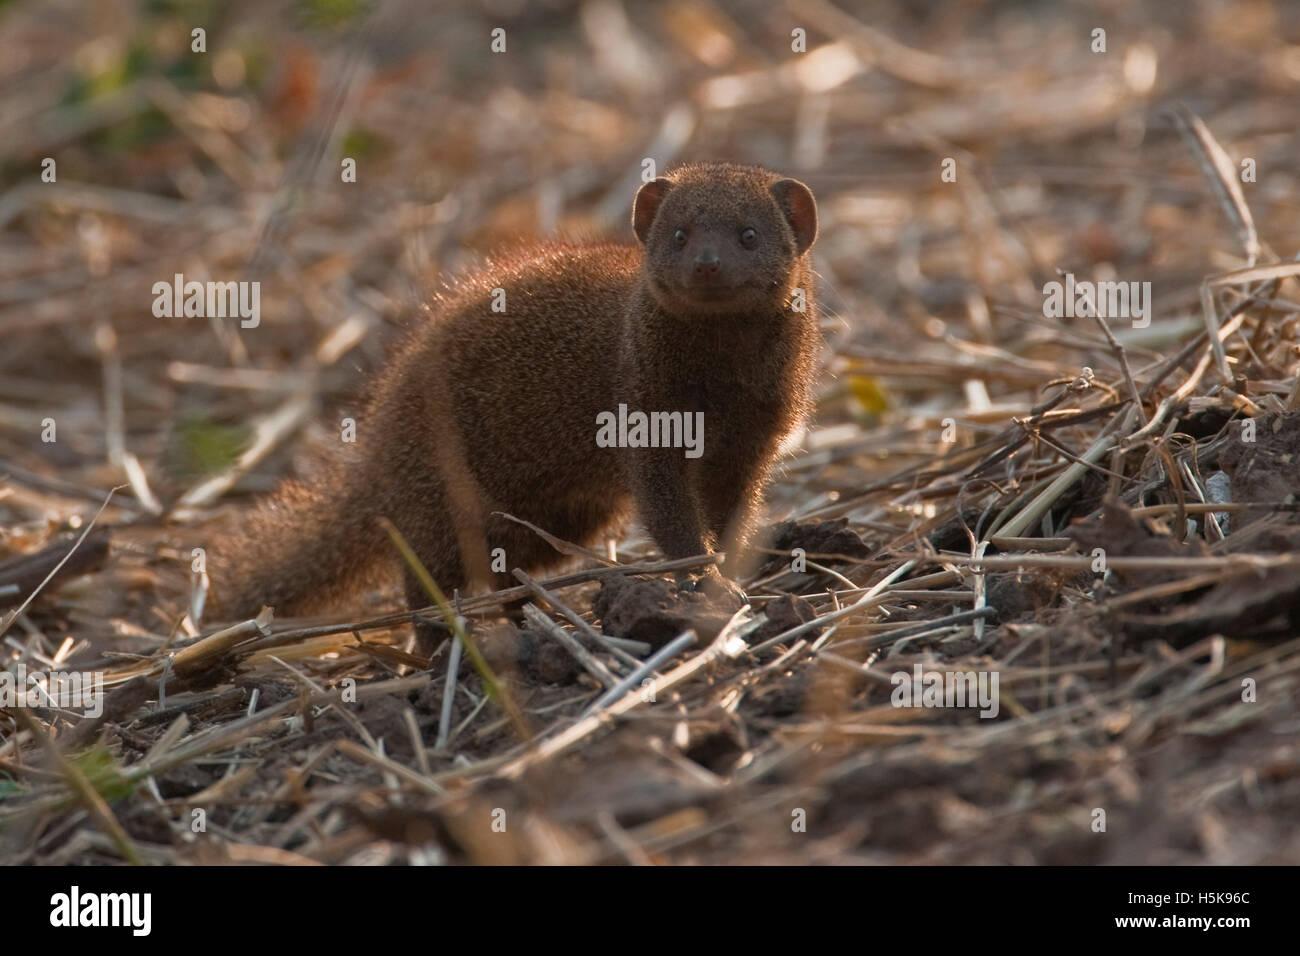 Yellow Mongoose (Cynictis penicillata), Hwange National Park, Zimbabwe, Africa Stock Photo